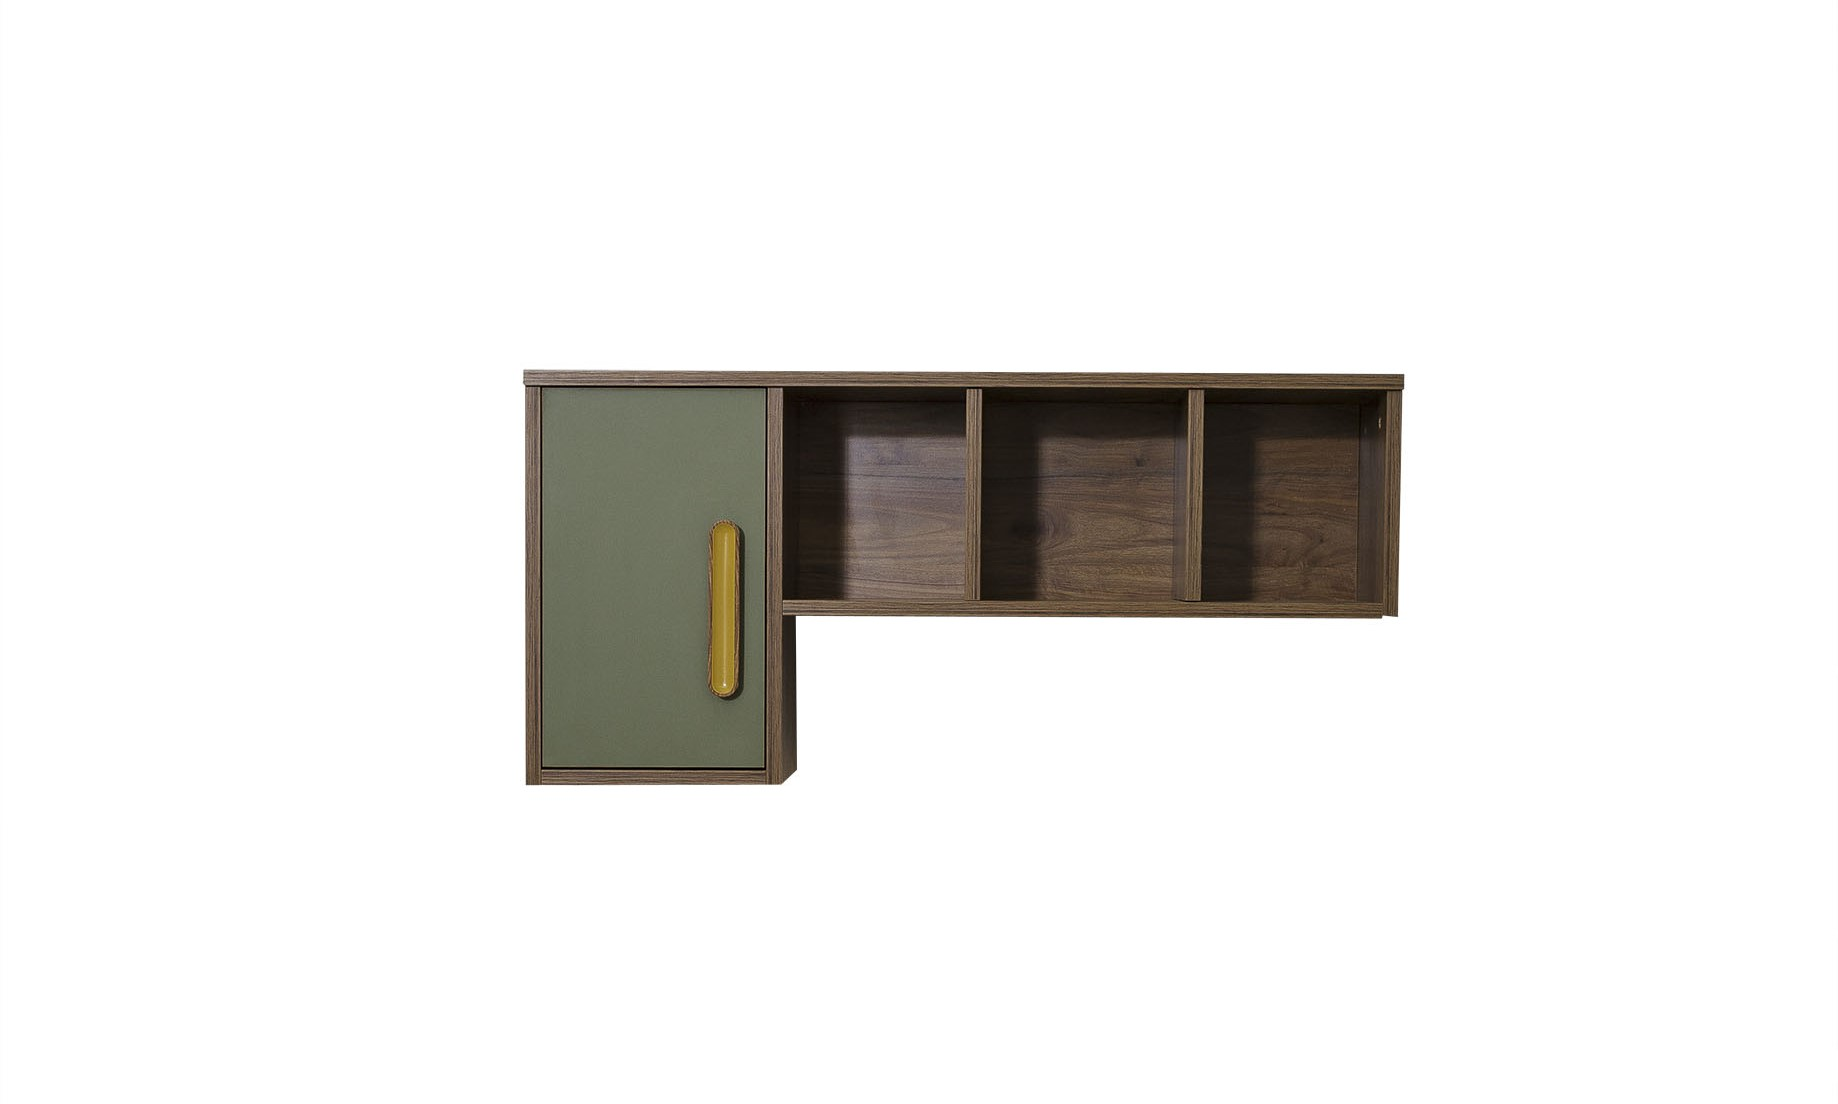 Titi Schreibtischaufsatz Wandregal Trendy in Holzoptik